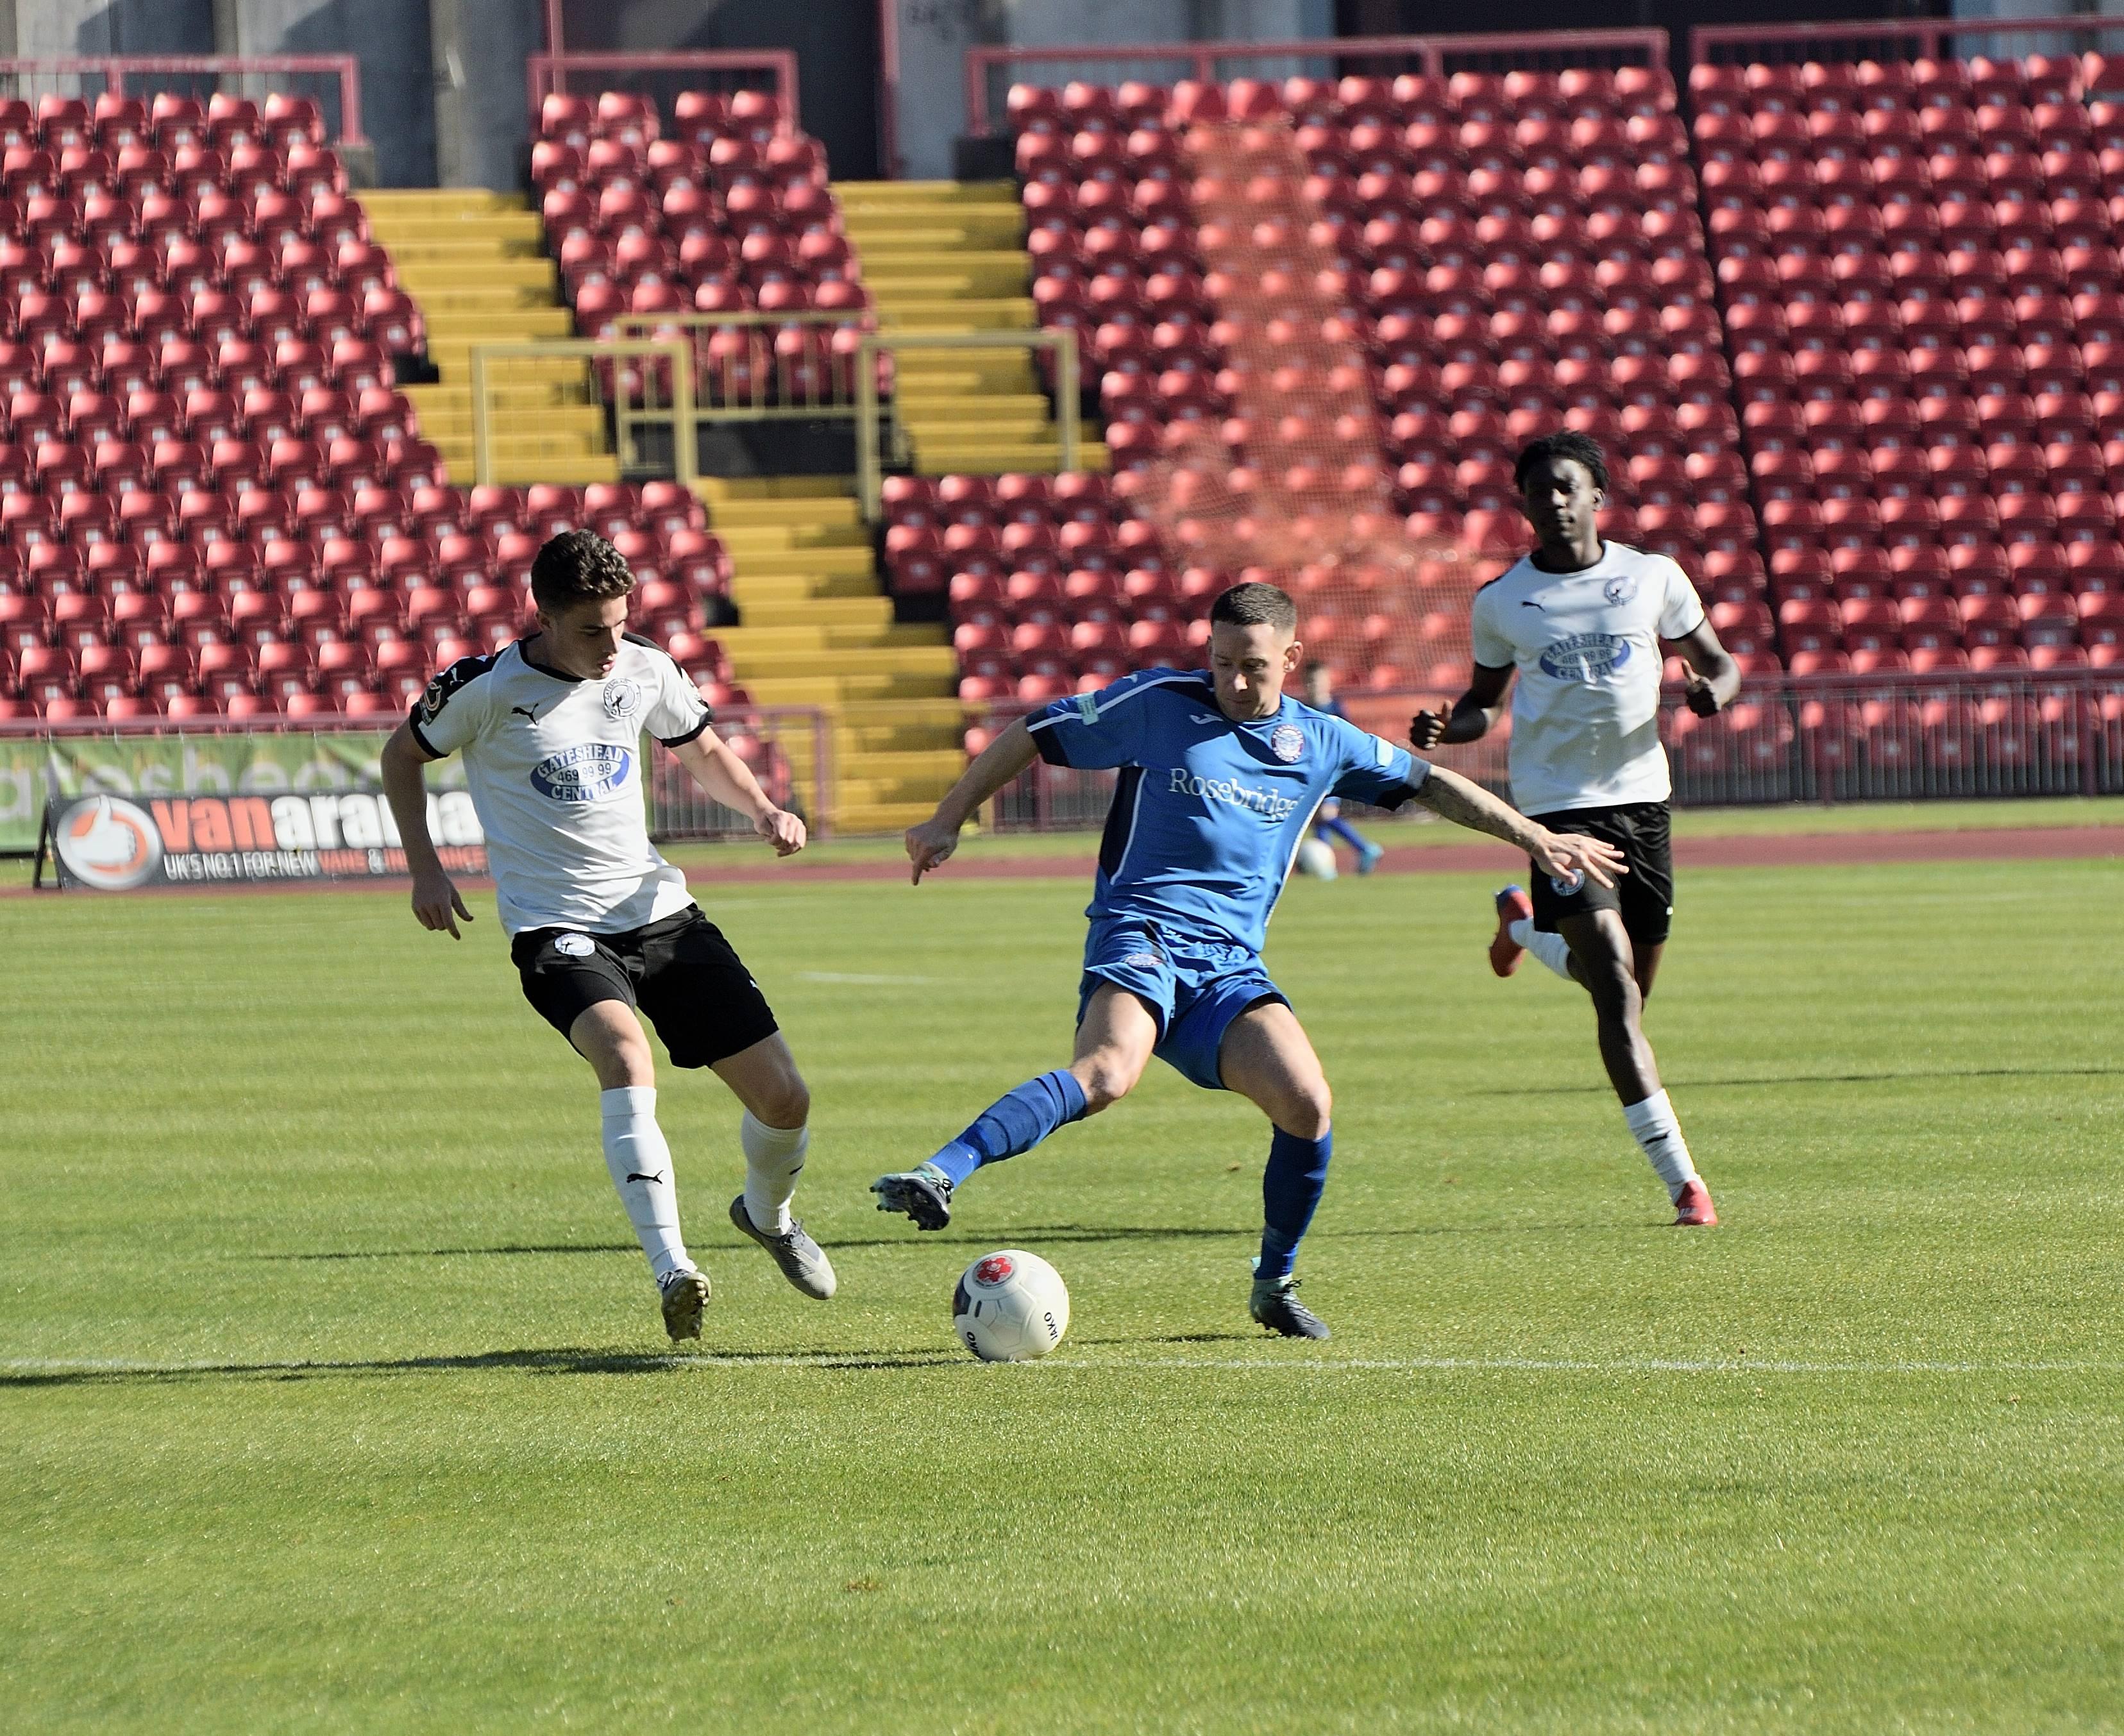 Gateshead 6 Rams 0 - Match Action